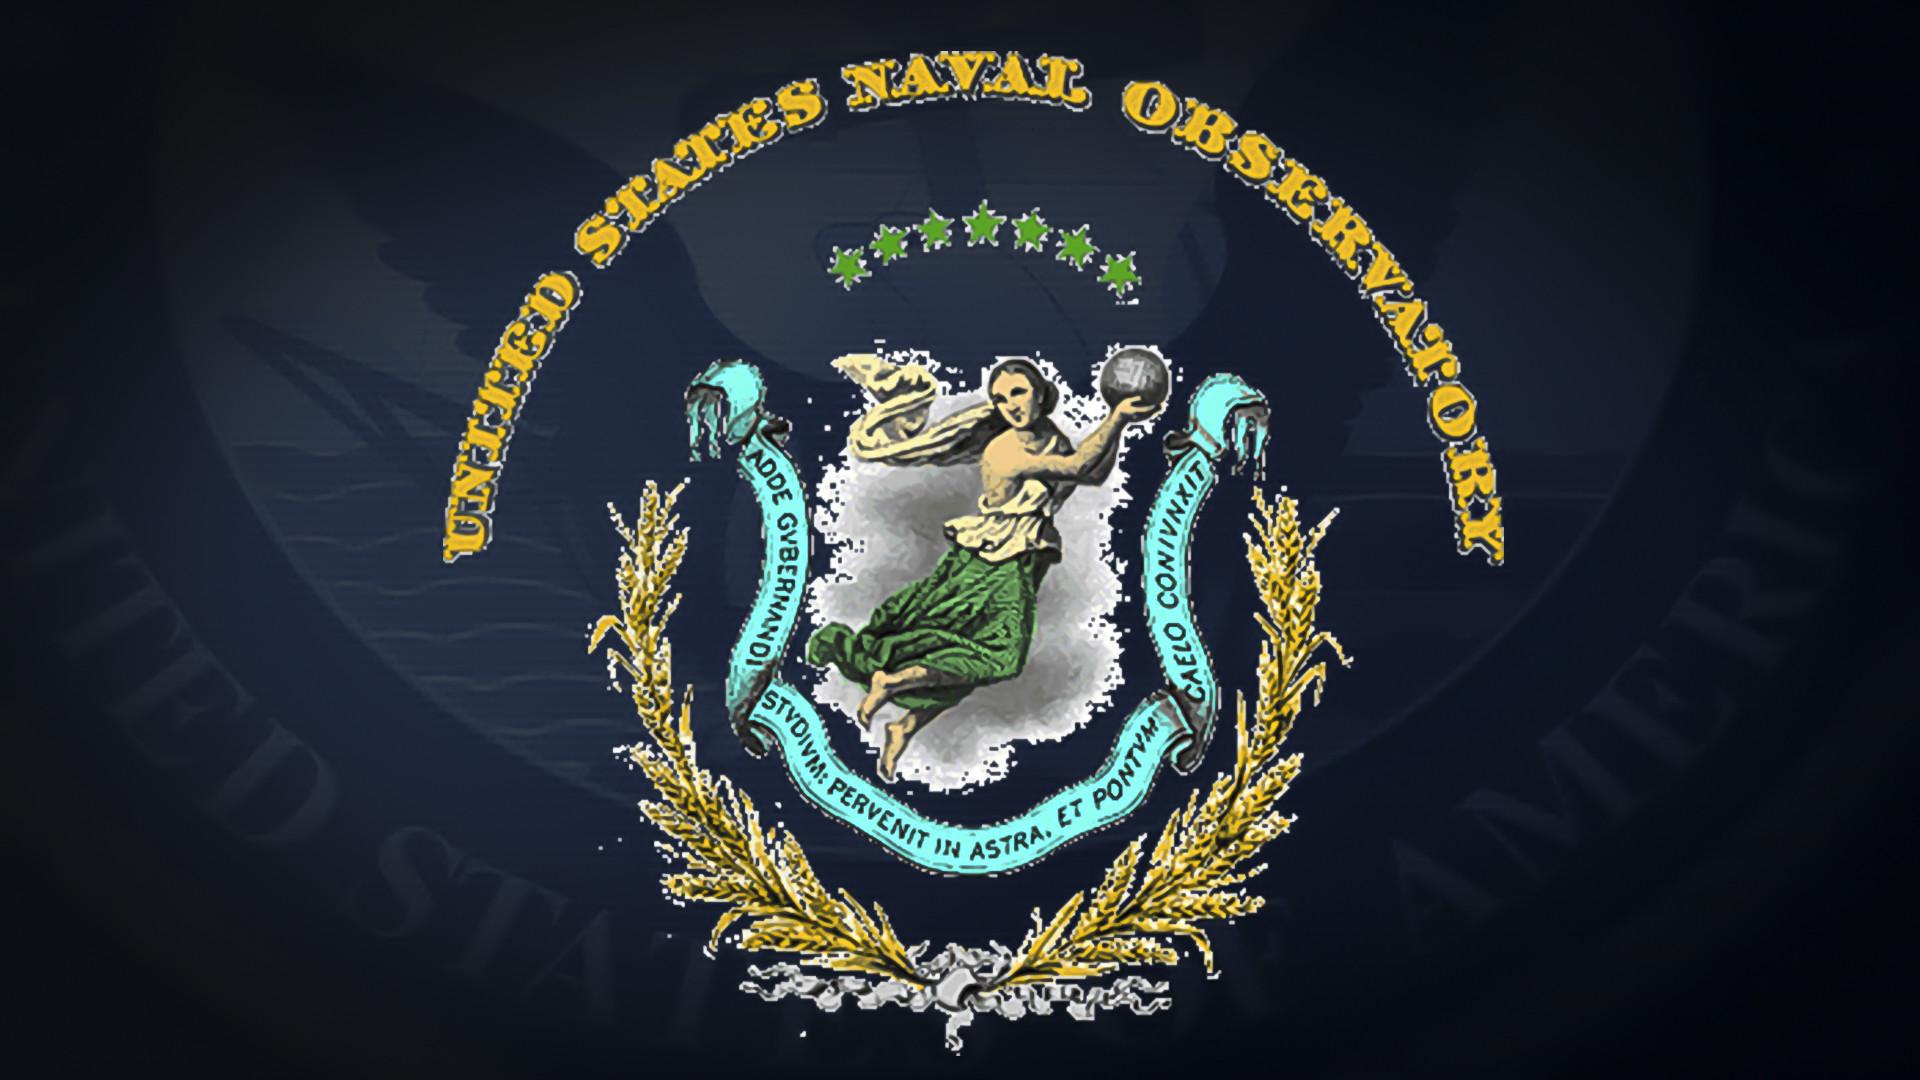 us navy seal logo wallpaper 56 images